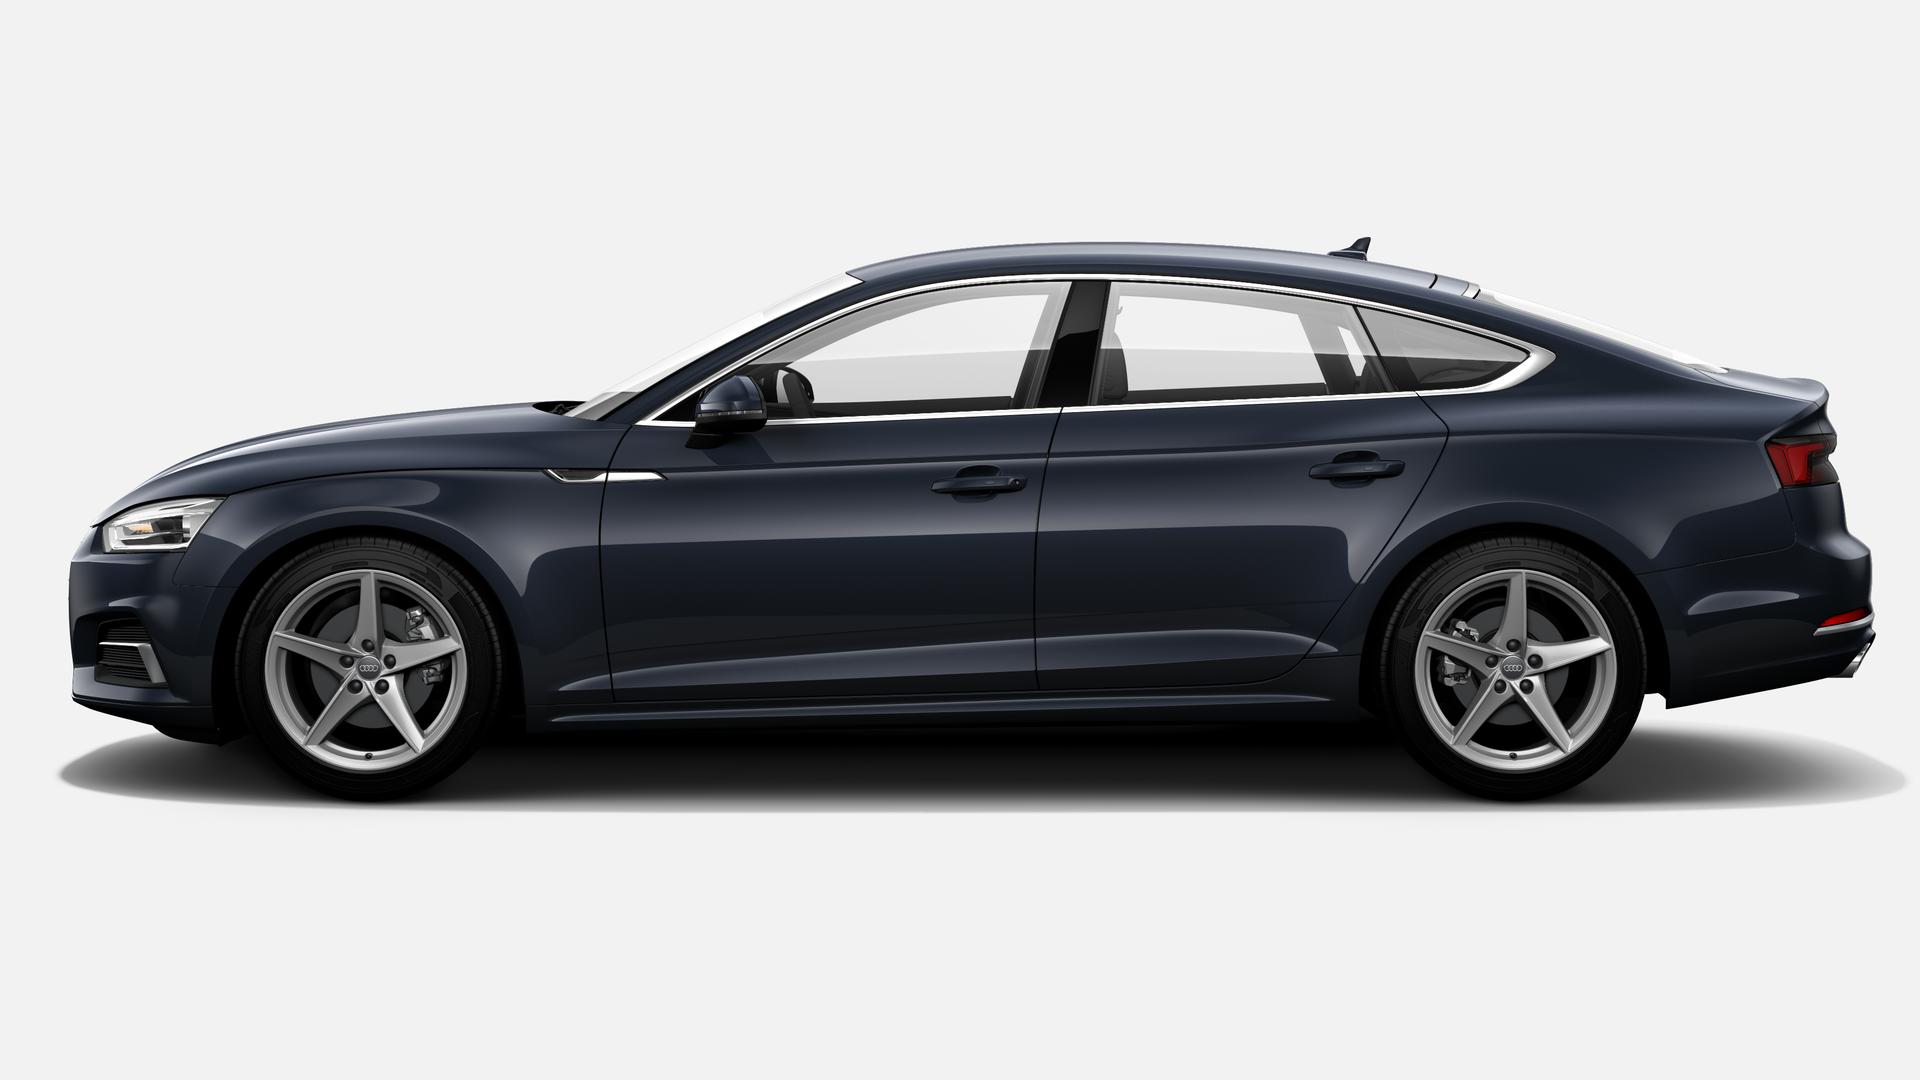 Vista Lateral izquierda de Audi A5 Sportback 2.0 TFSI Sport S tronic 140 kW (190 CV)